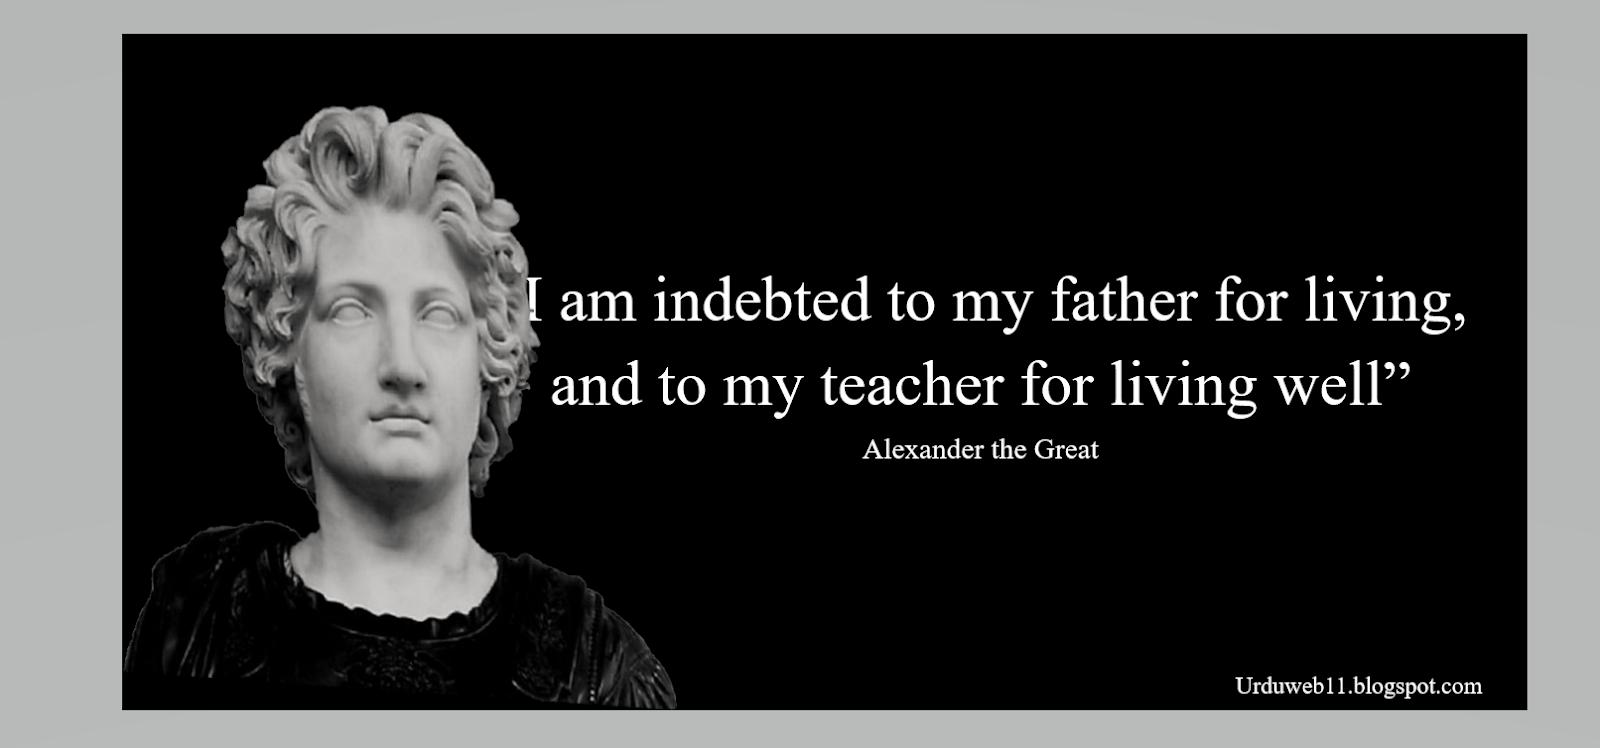 Quotes Of Alexander The Great Urdu Web11